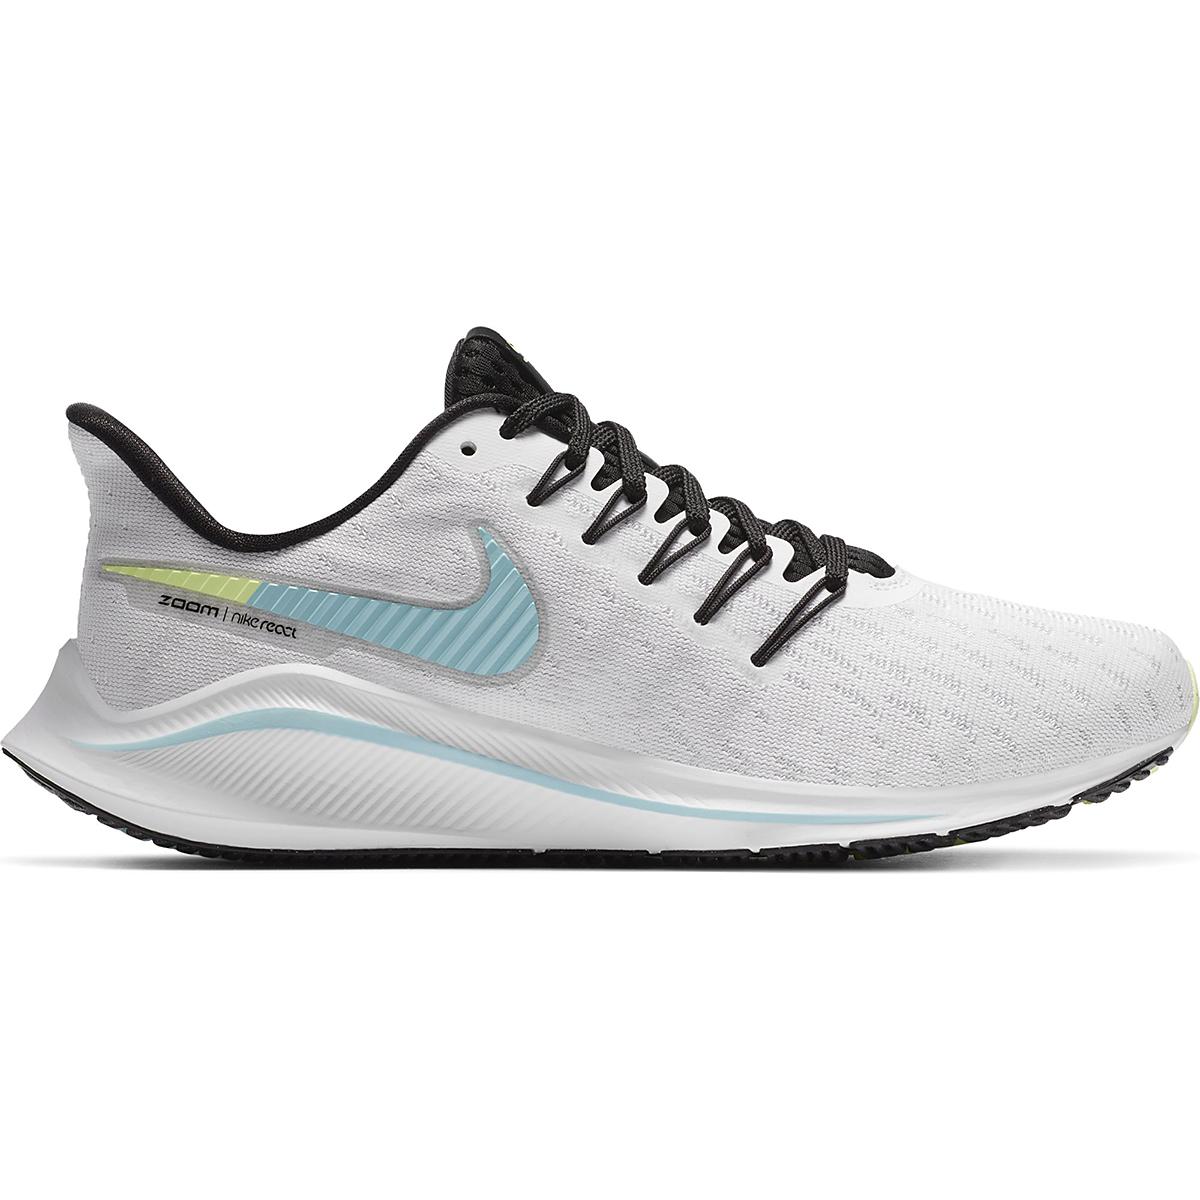 Women's Nike Vomero 14 Running Shoe - Color: White/Glacier Ice-Black-Pure Platinum - Size: 5 - Width: Regular, White/Glacier Ice-Black-Pure Platinum, large, image 1